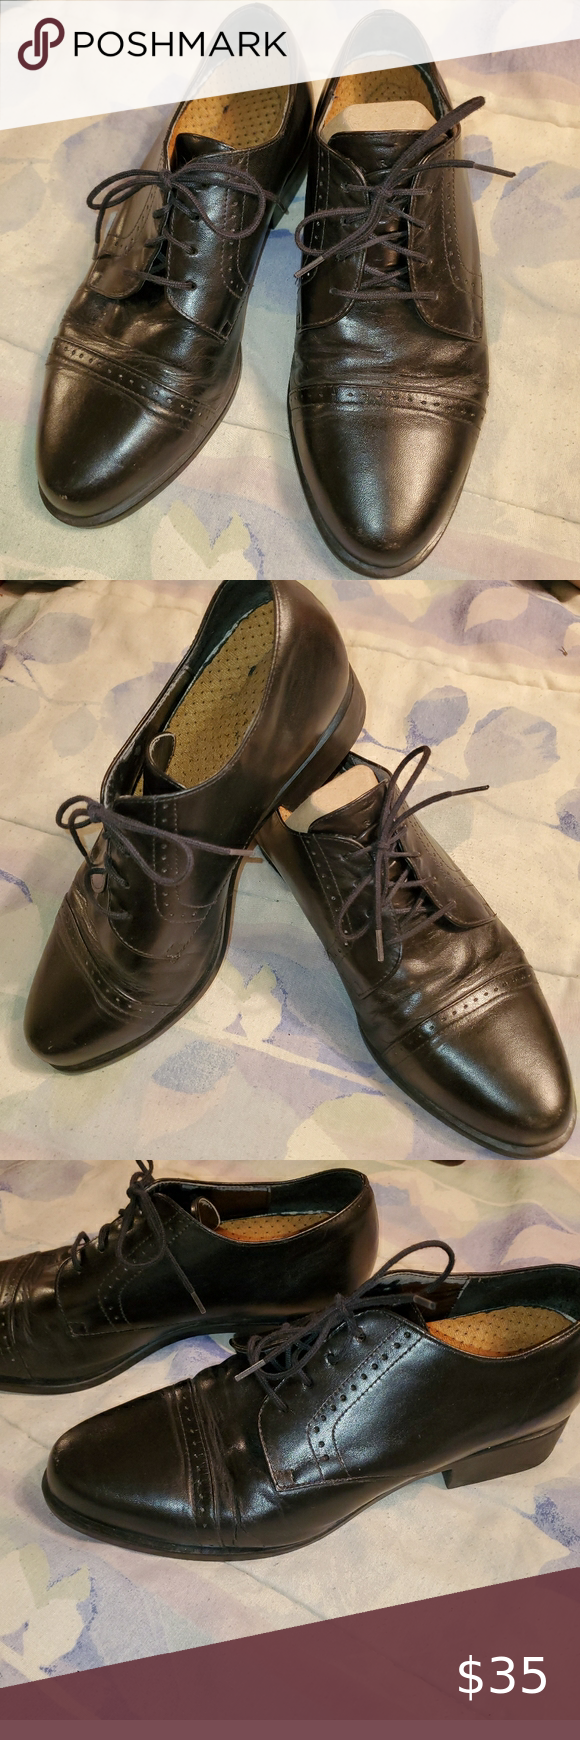 Mens Dress Shoe Dress Shoes Men Black Dress Shoe Dress Shoes [ 1740 x 580 Pixel ]